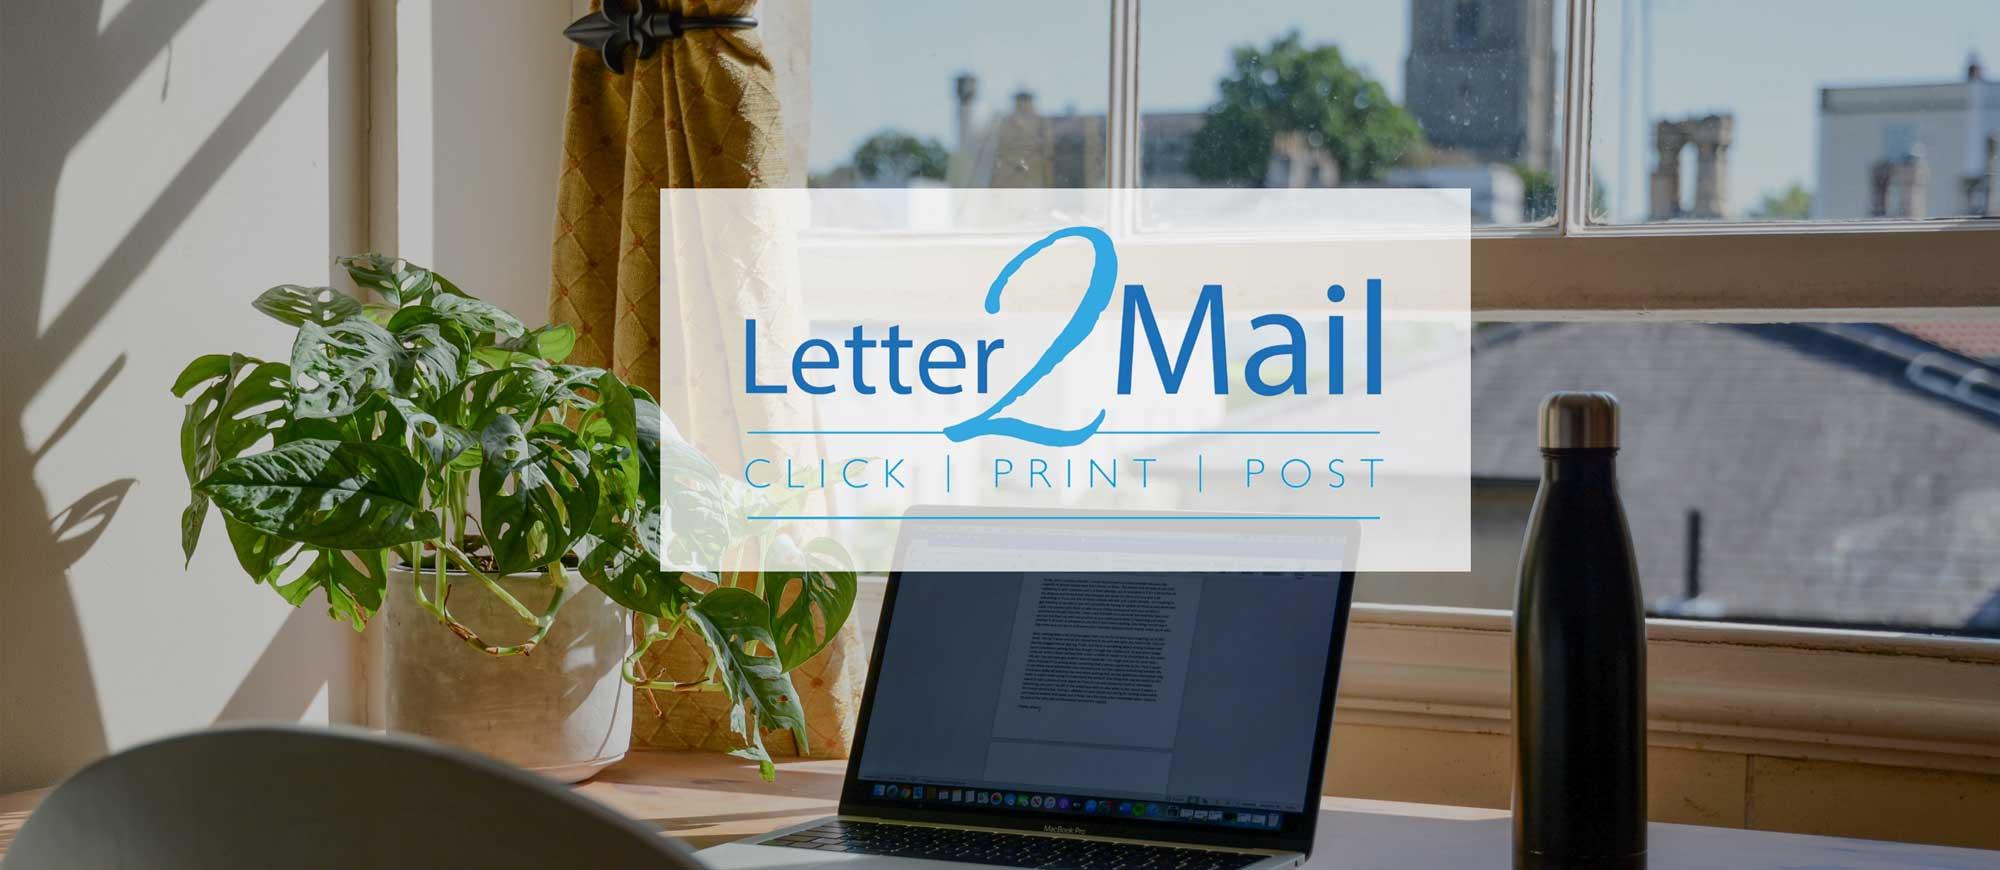 unsplash letter2mail web - Letter2Mail